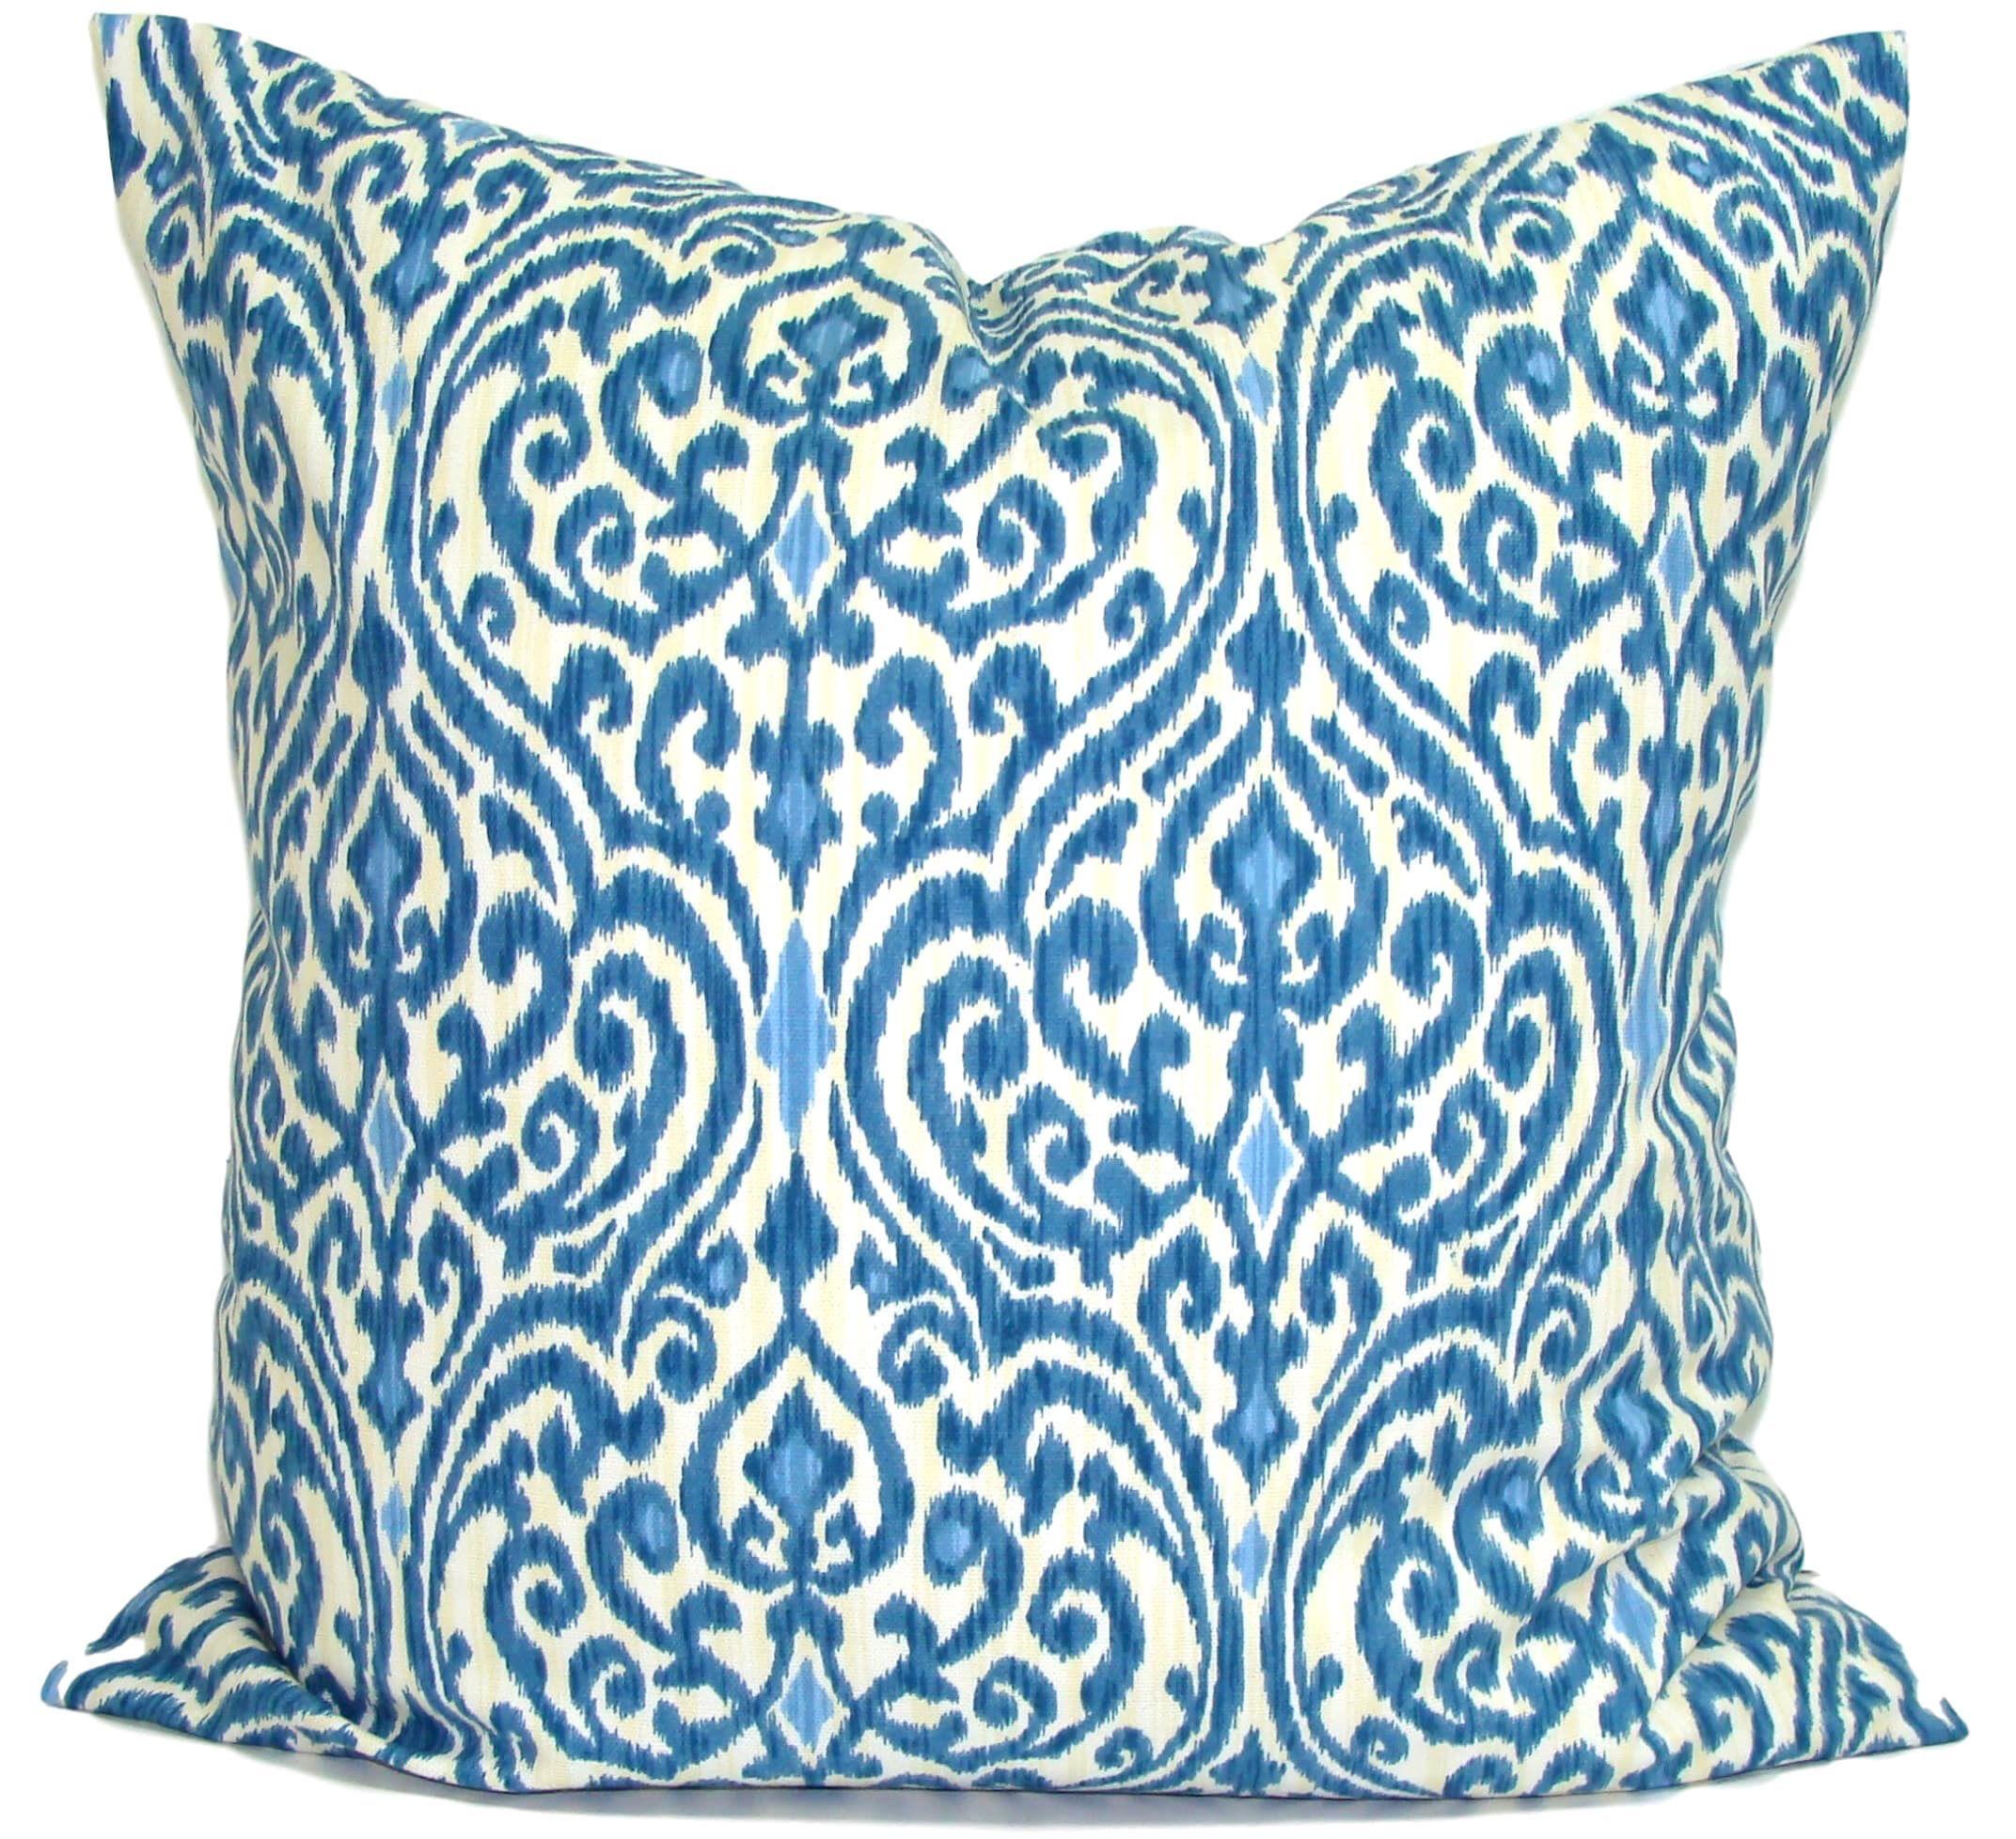 Indigo Blue Pillow Cover Blue Throw Pillow Cover Blue Pillow Cover Cushion Decorative Pillow Indigo Blue Pillows